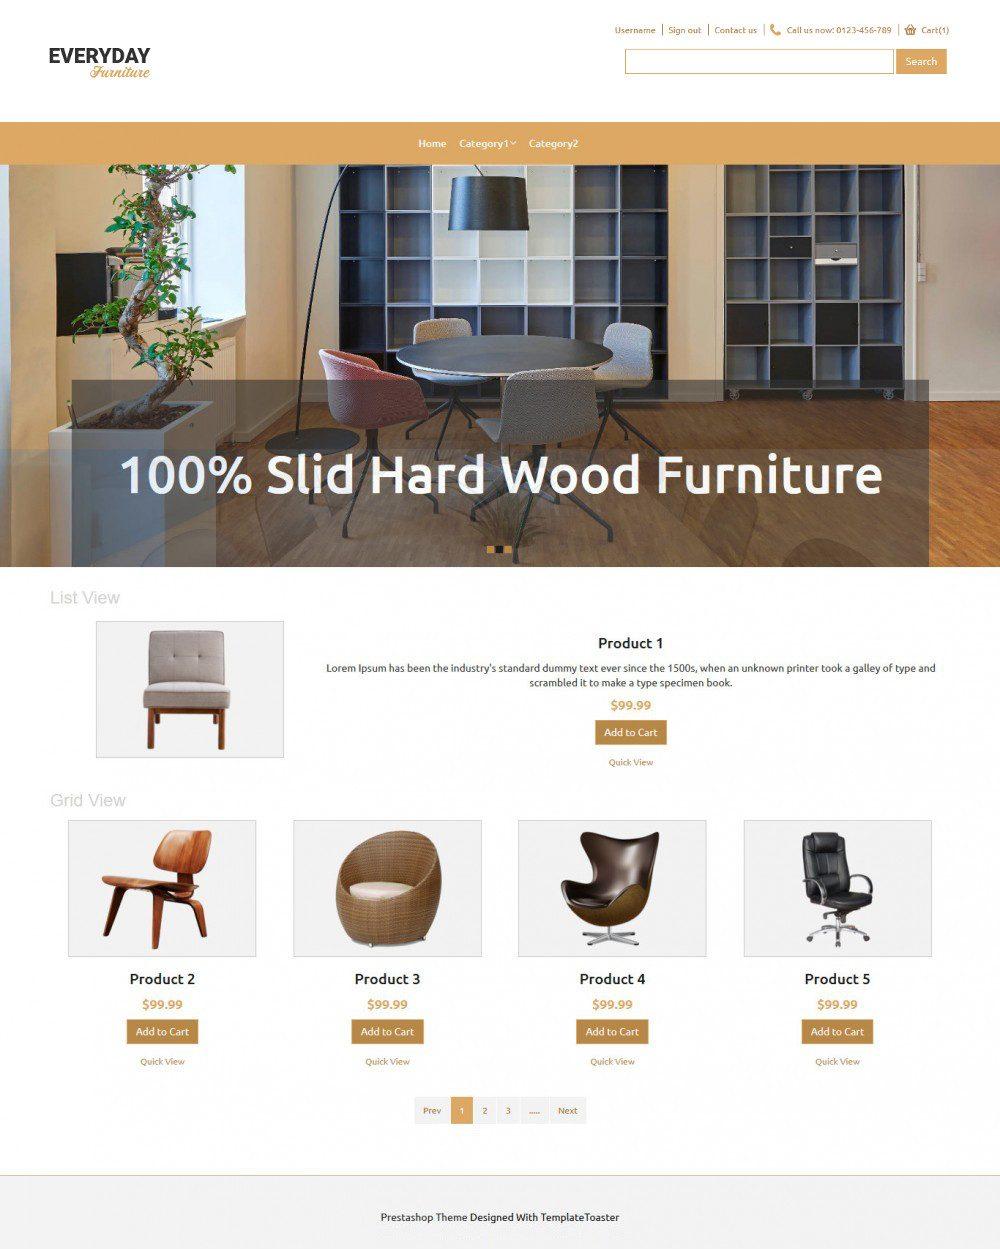 Everyday Furniture PrestaShop Theme